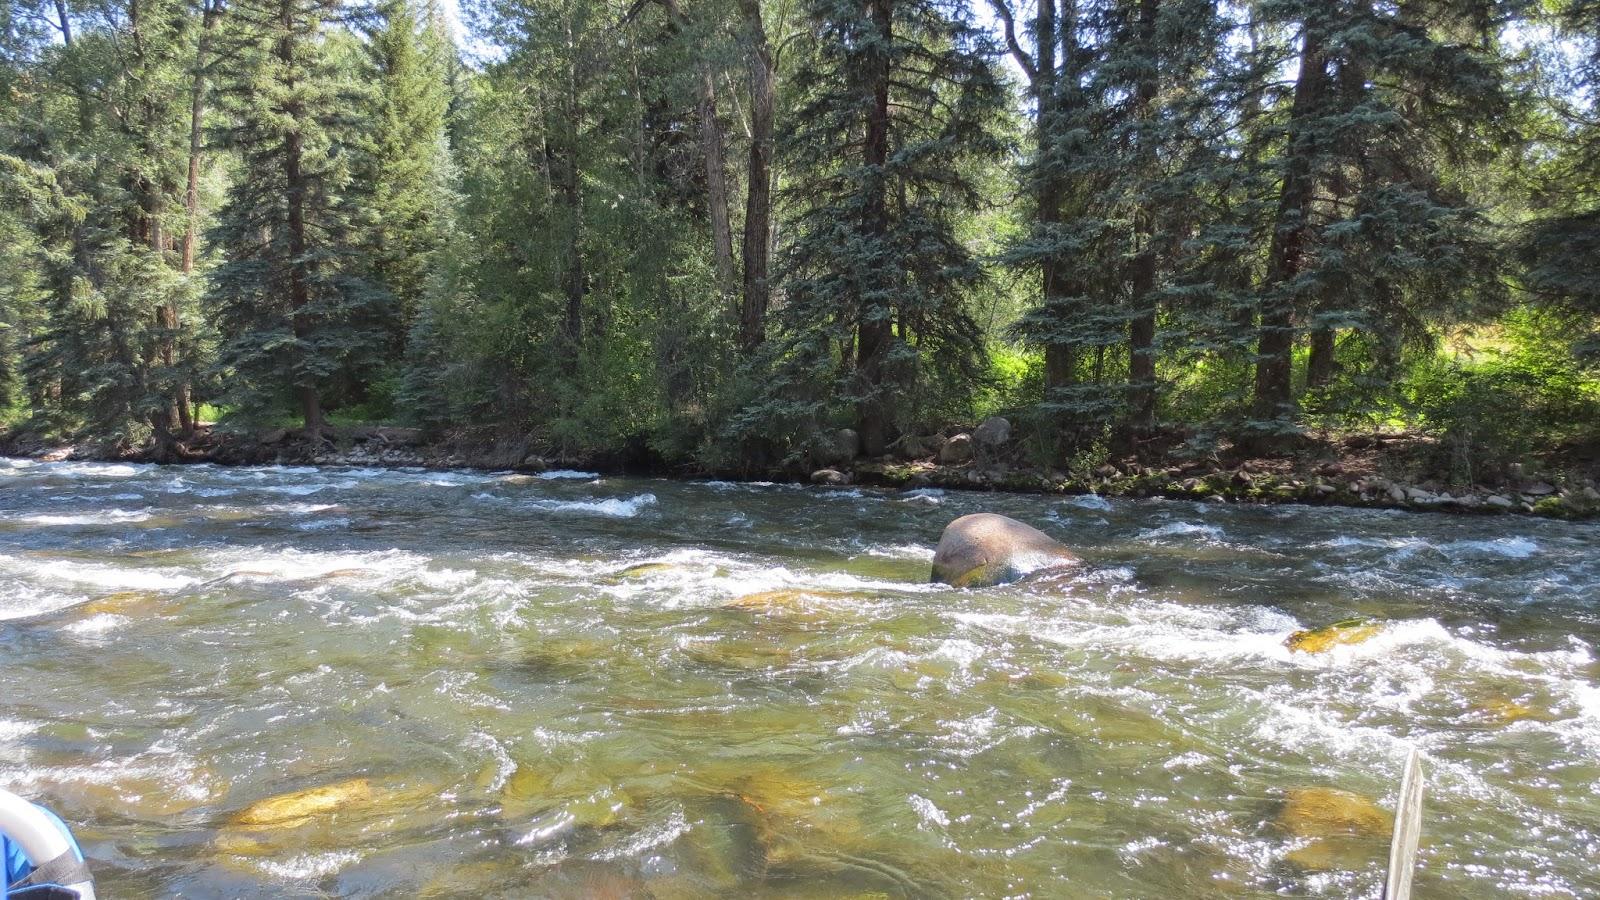 Jay scott outdoors 7 20 14 colorado fishing report for Roaring river fishing